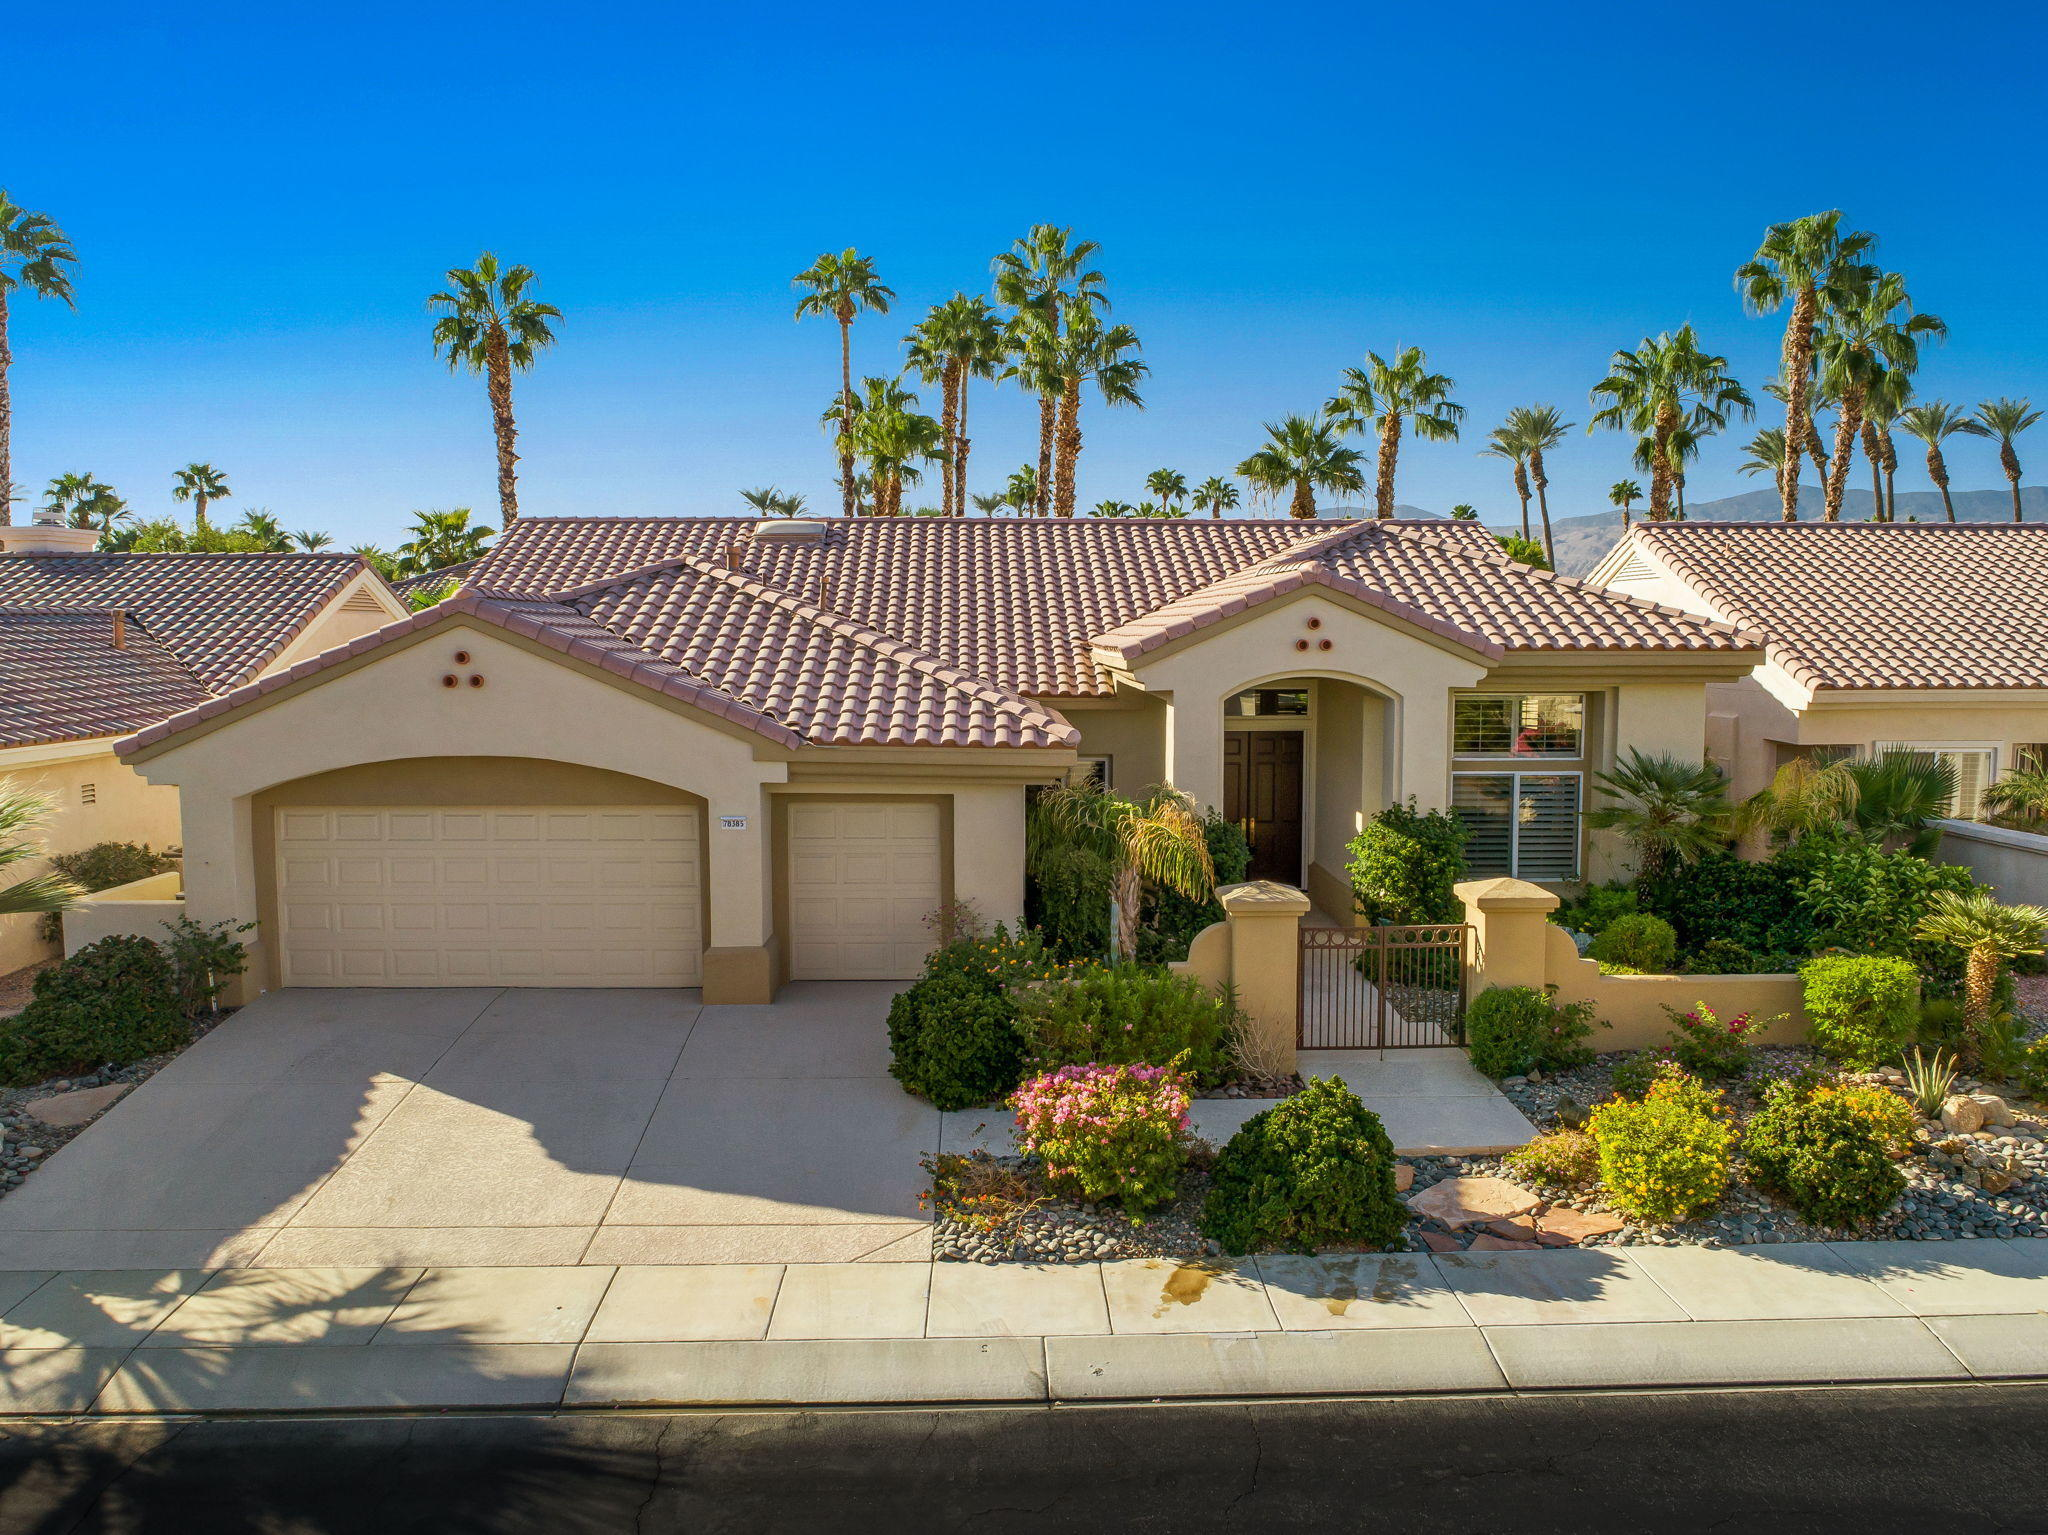 Photo of 78385 Silver Sage Drive, Palm Desert, CA 92211